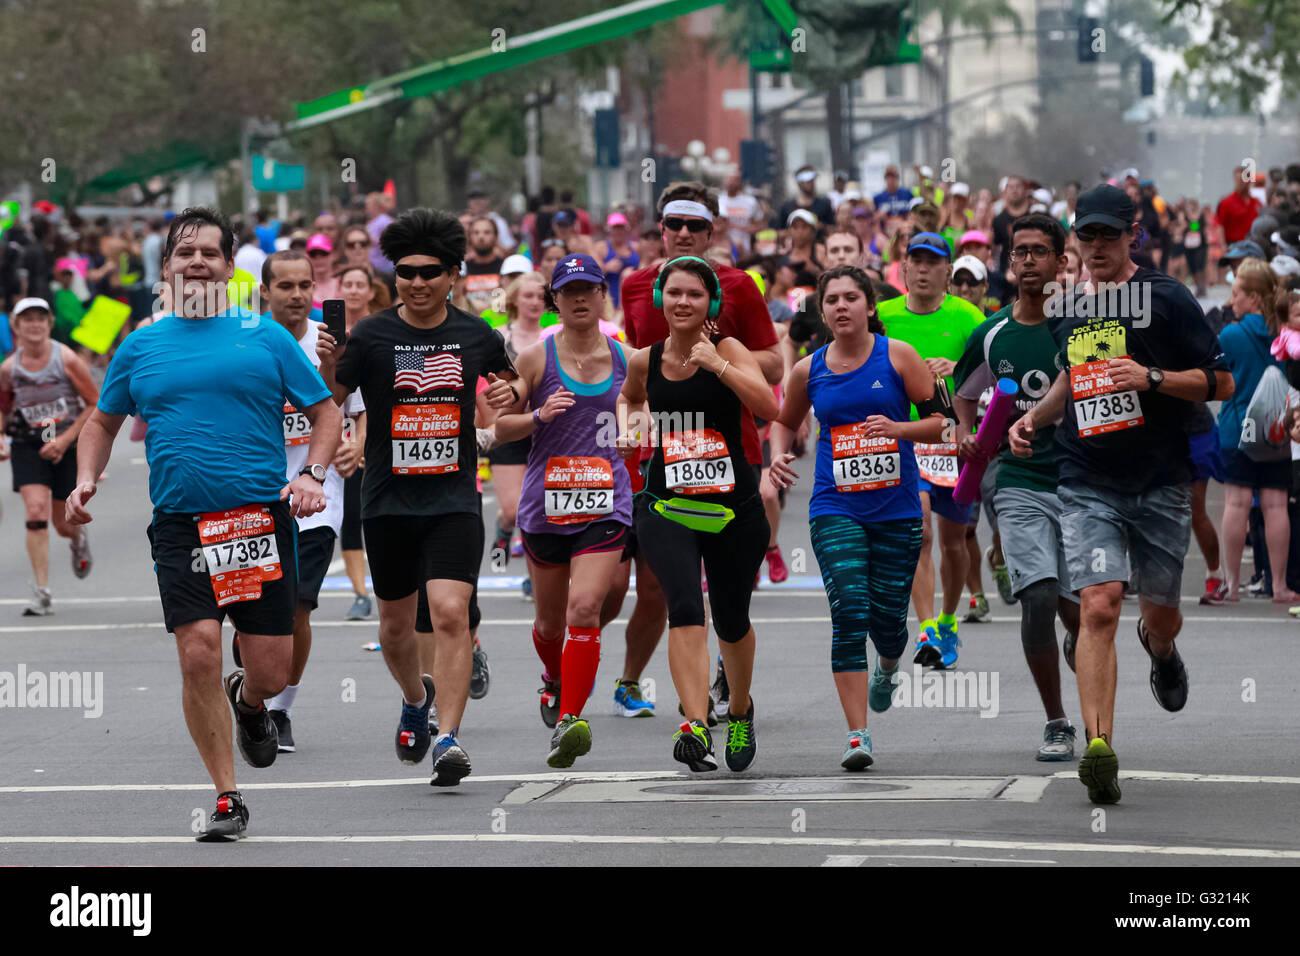 San Diego, California, USA. 5th June, 2016. SAN DIEGO CA, USA -- JUNE 2, 2016: .Runners jog down the final stretch - Stock Image